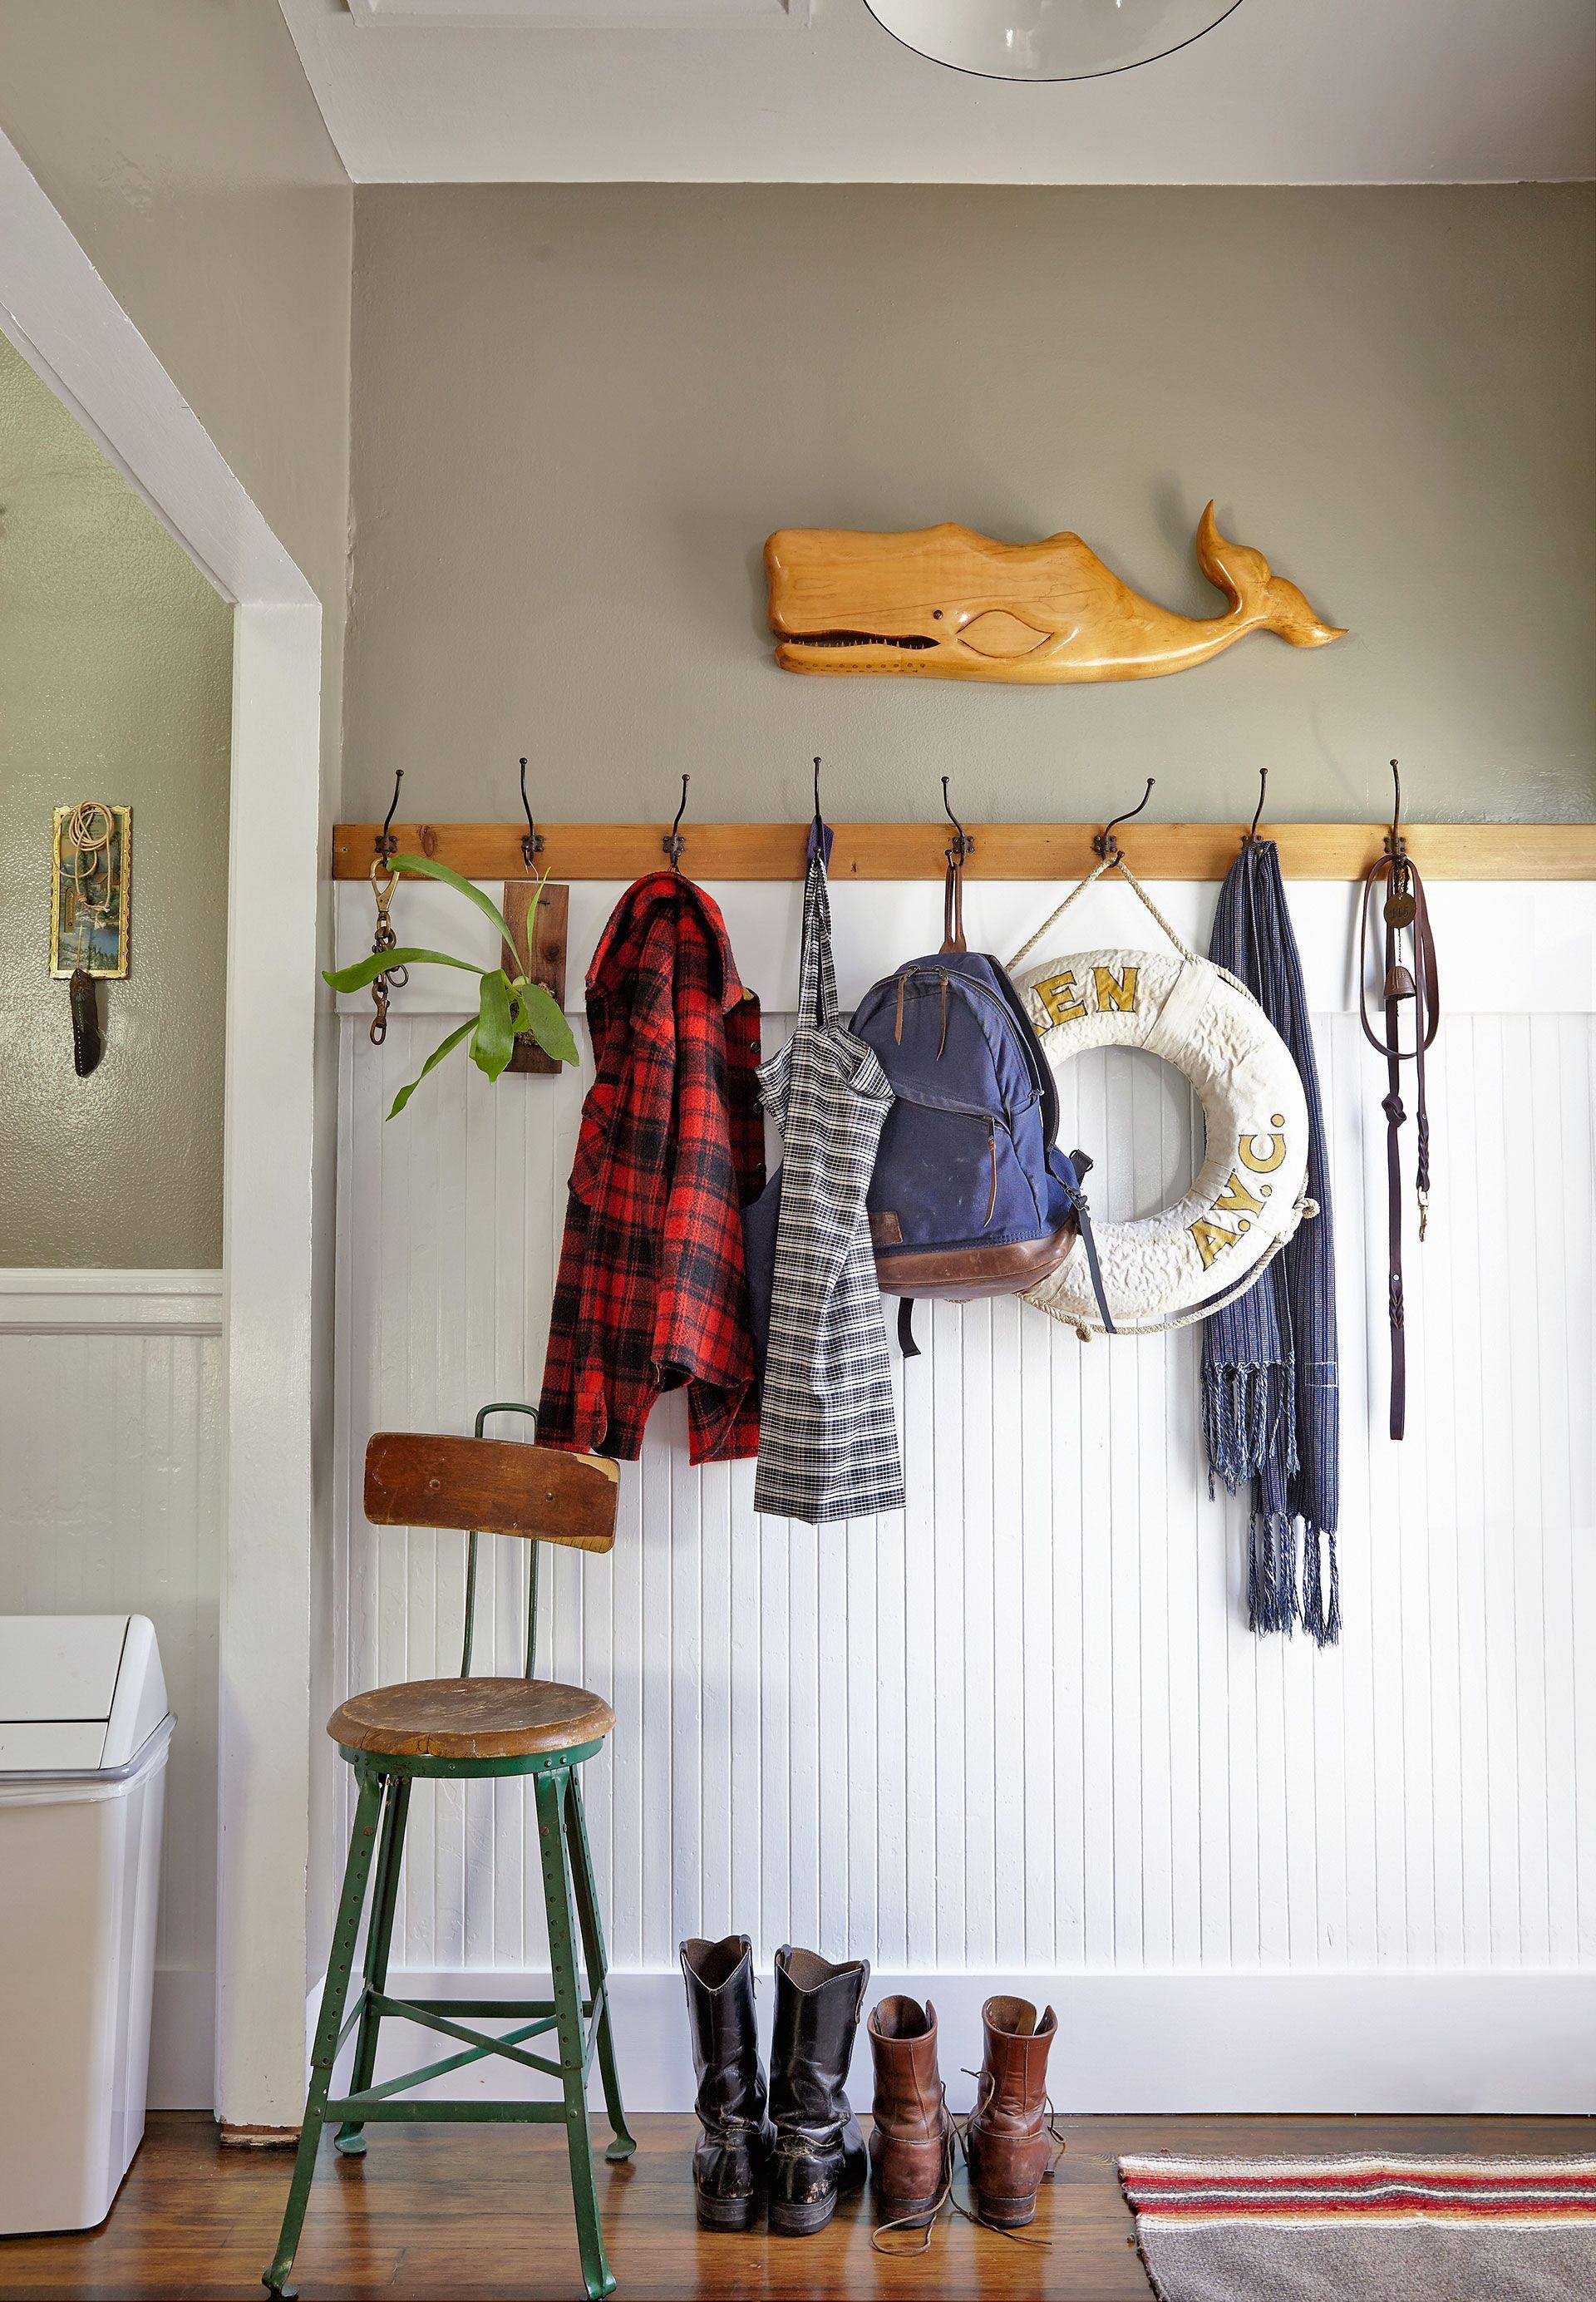 Mud Room Ideas - Decorating a Mud or Laundry Room